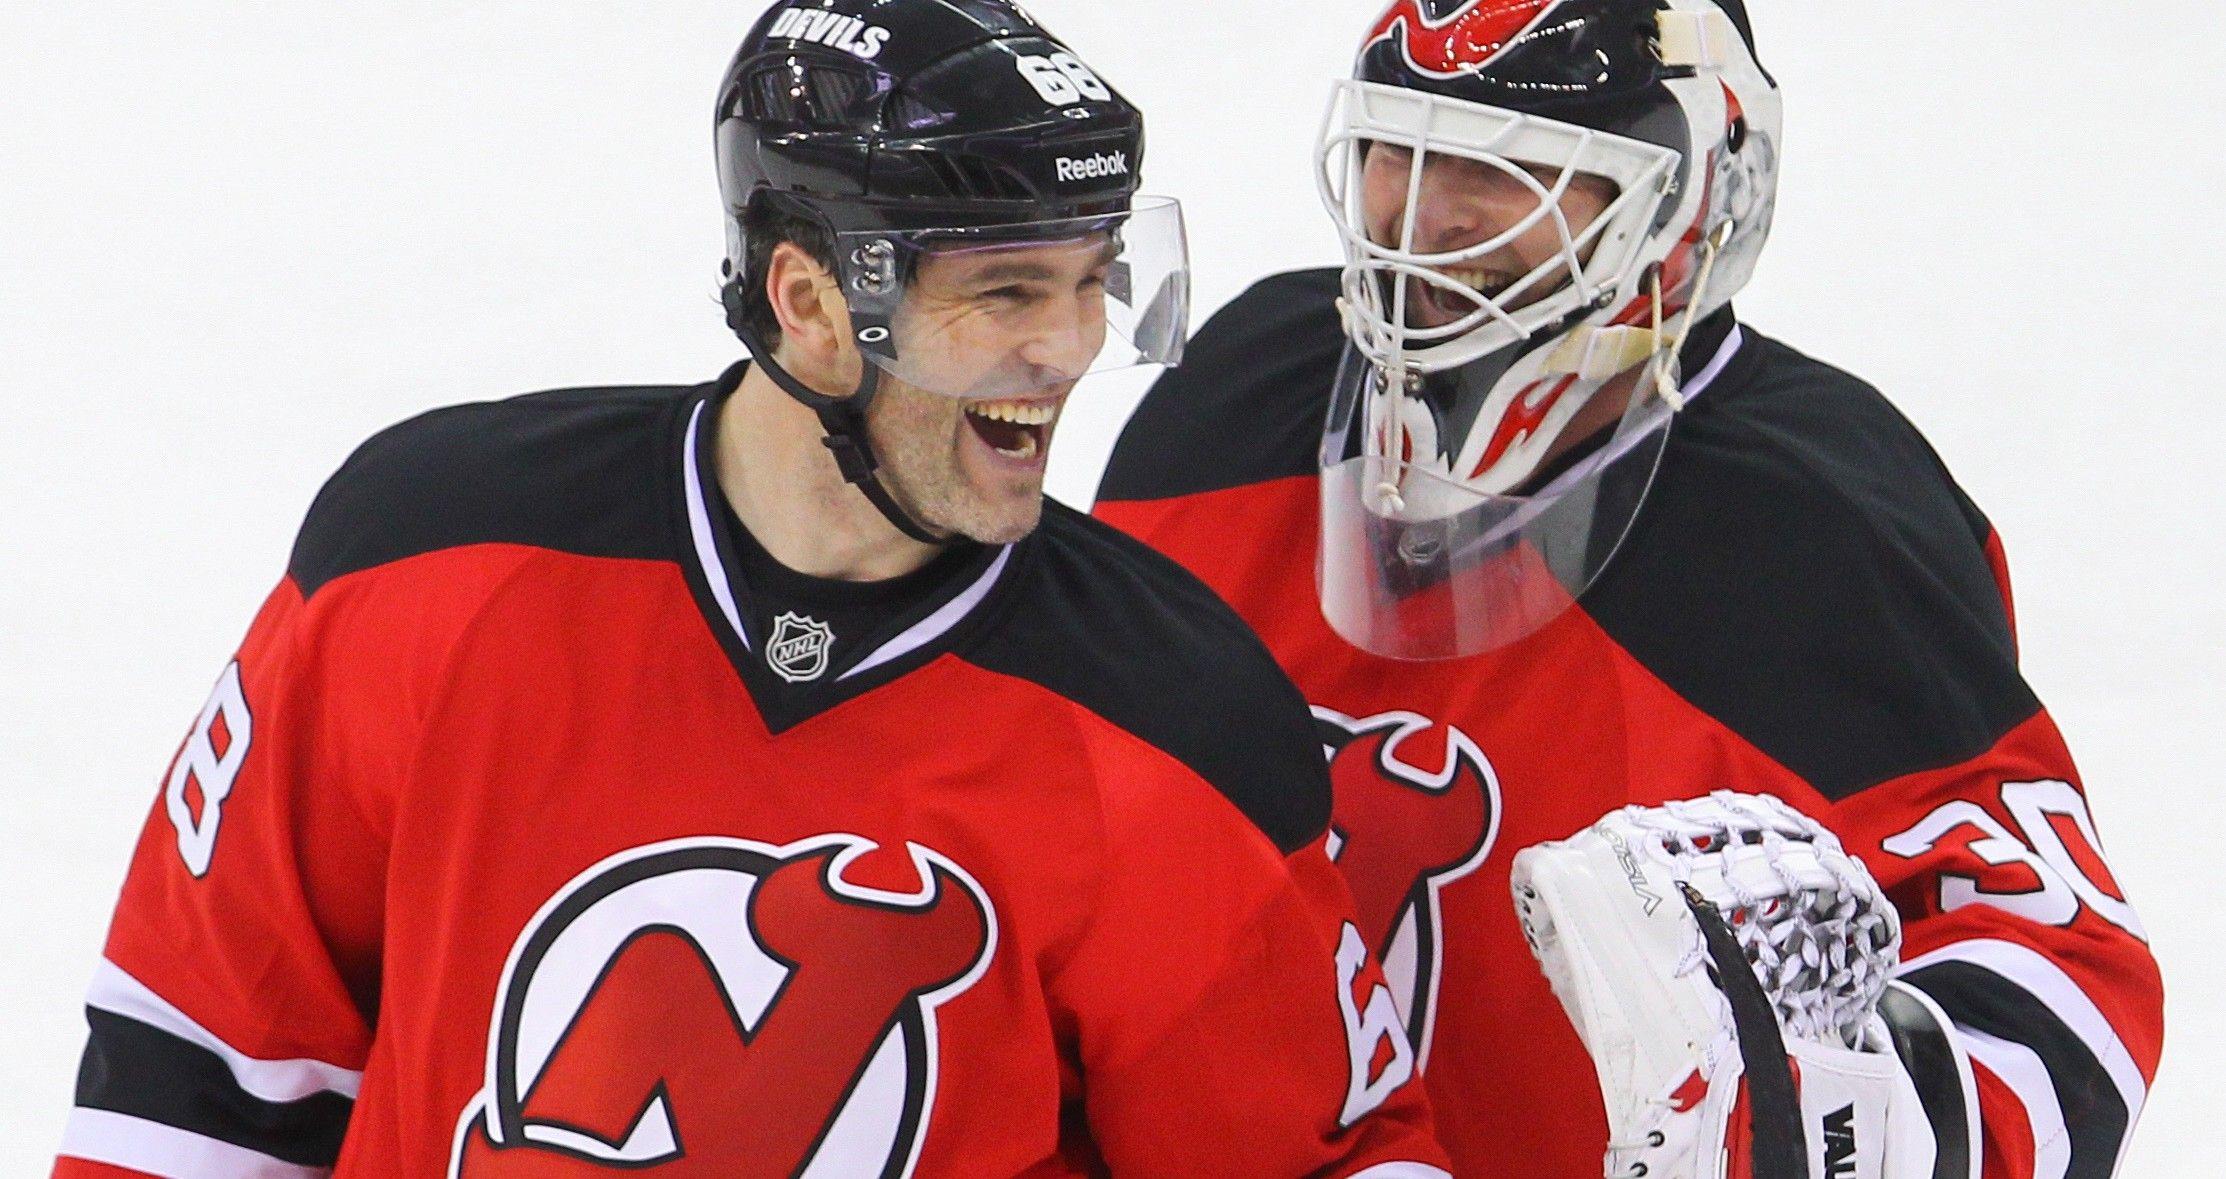 Top 15 Current NHL Career Earners